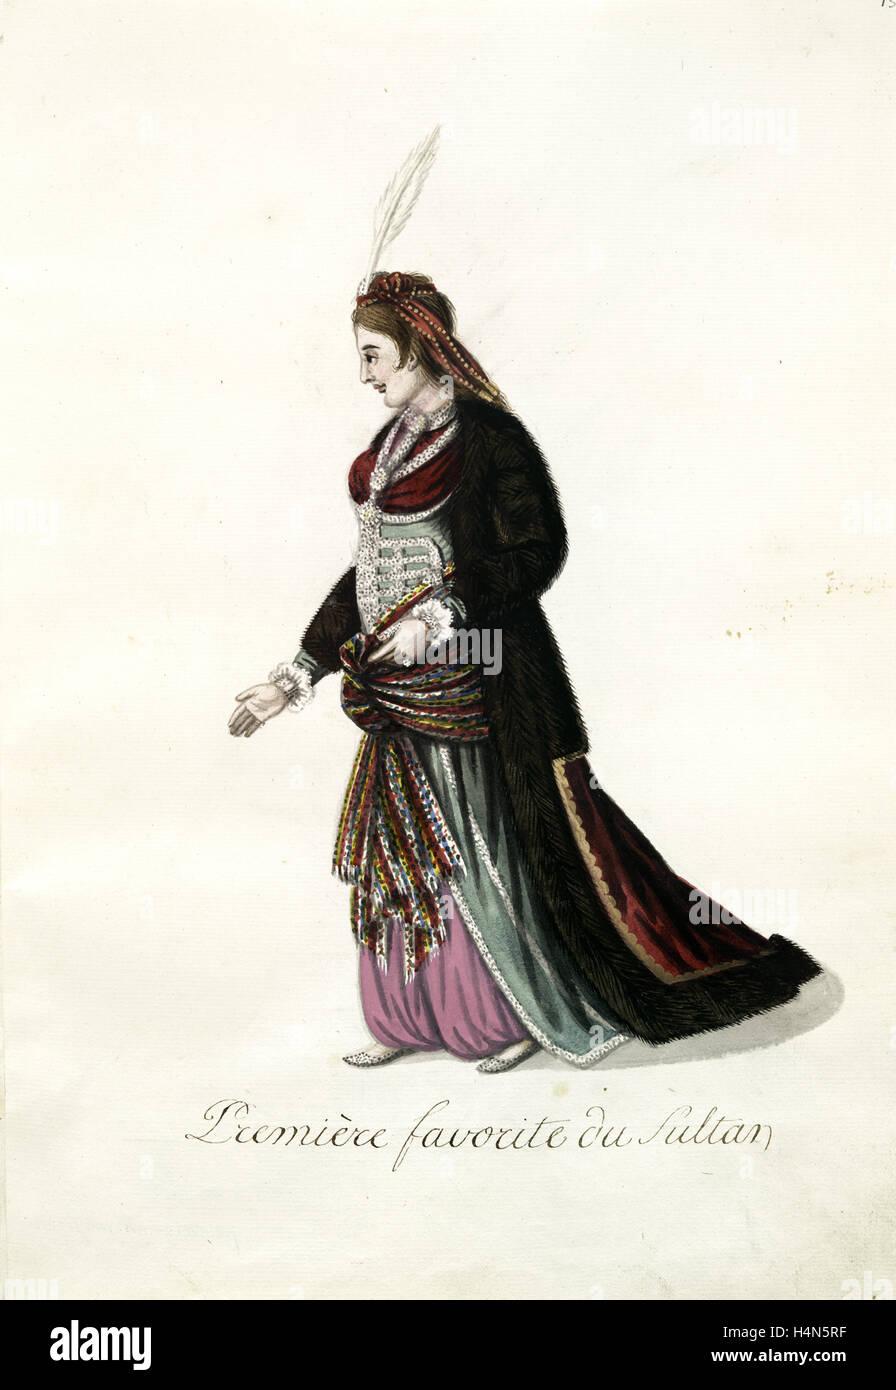 Première favorite du sultan. [73], Mahmud II, Sultan of the Turks, 1784-1839, (Patron) - Stock Image